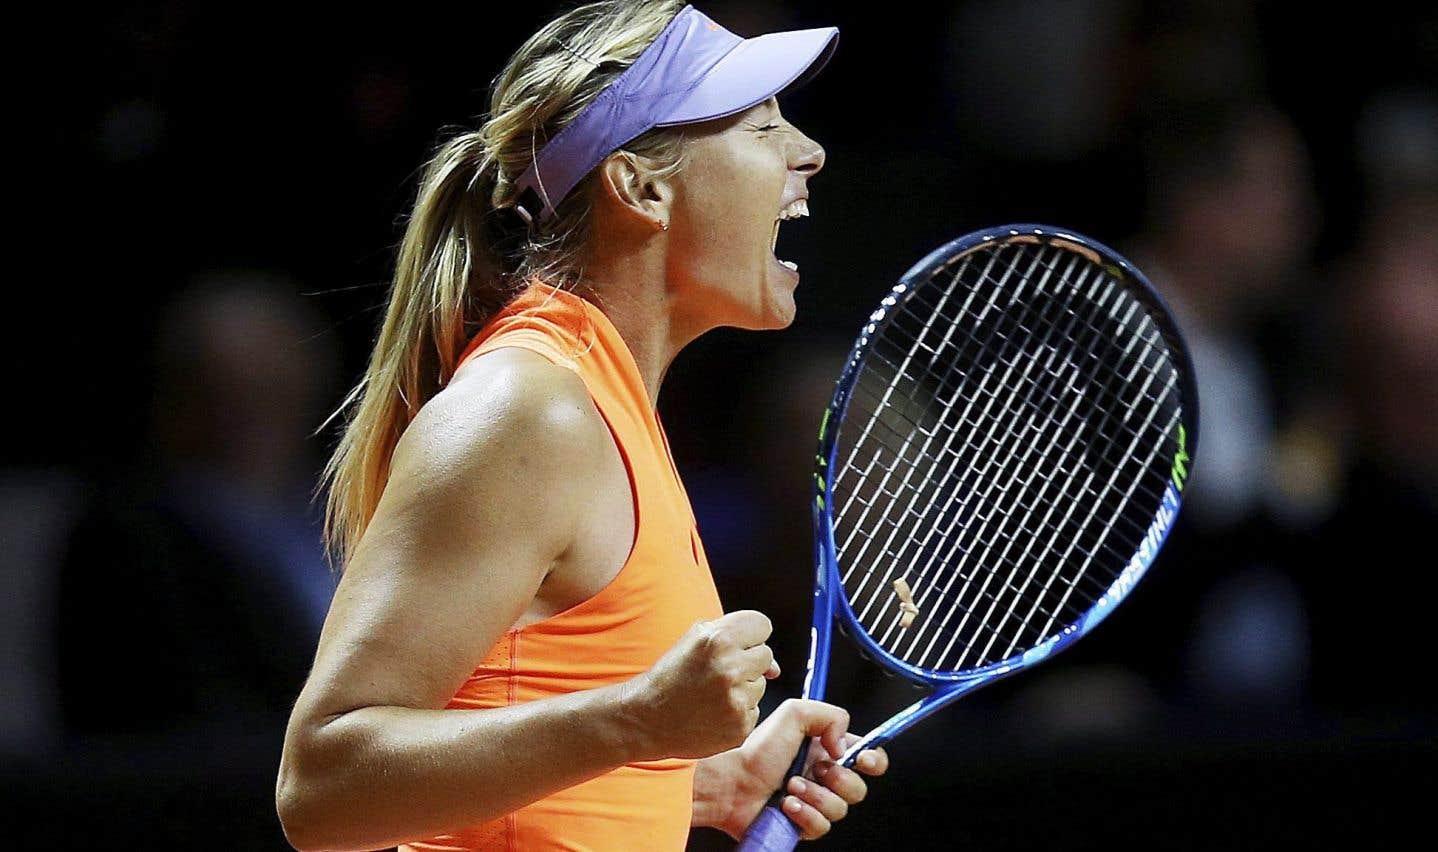 Maria Sharapova n'obtient pas une invitation pour disputer Roland Garros